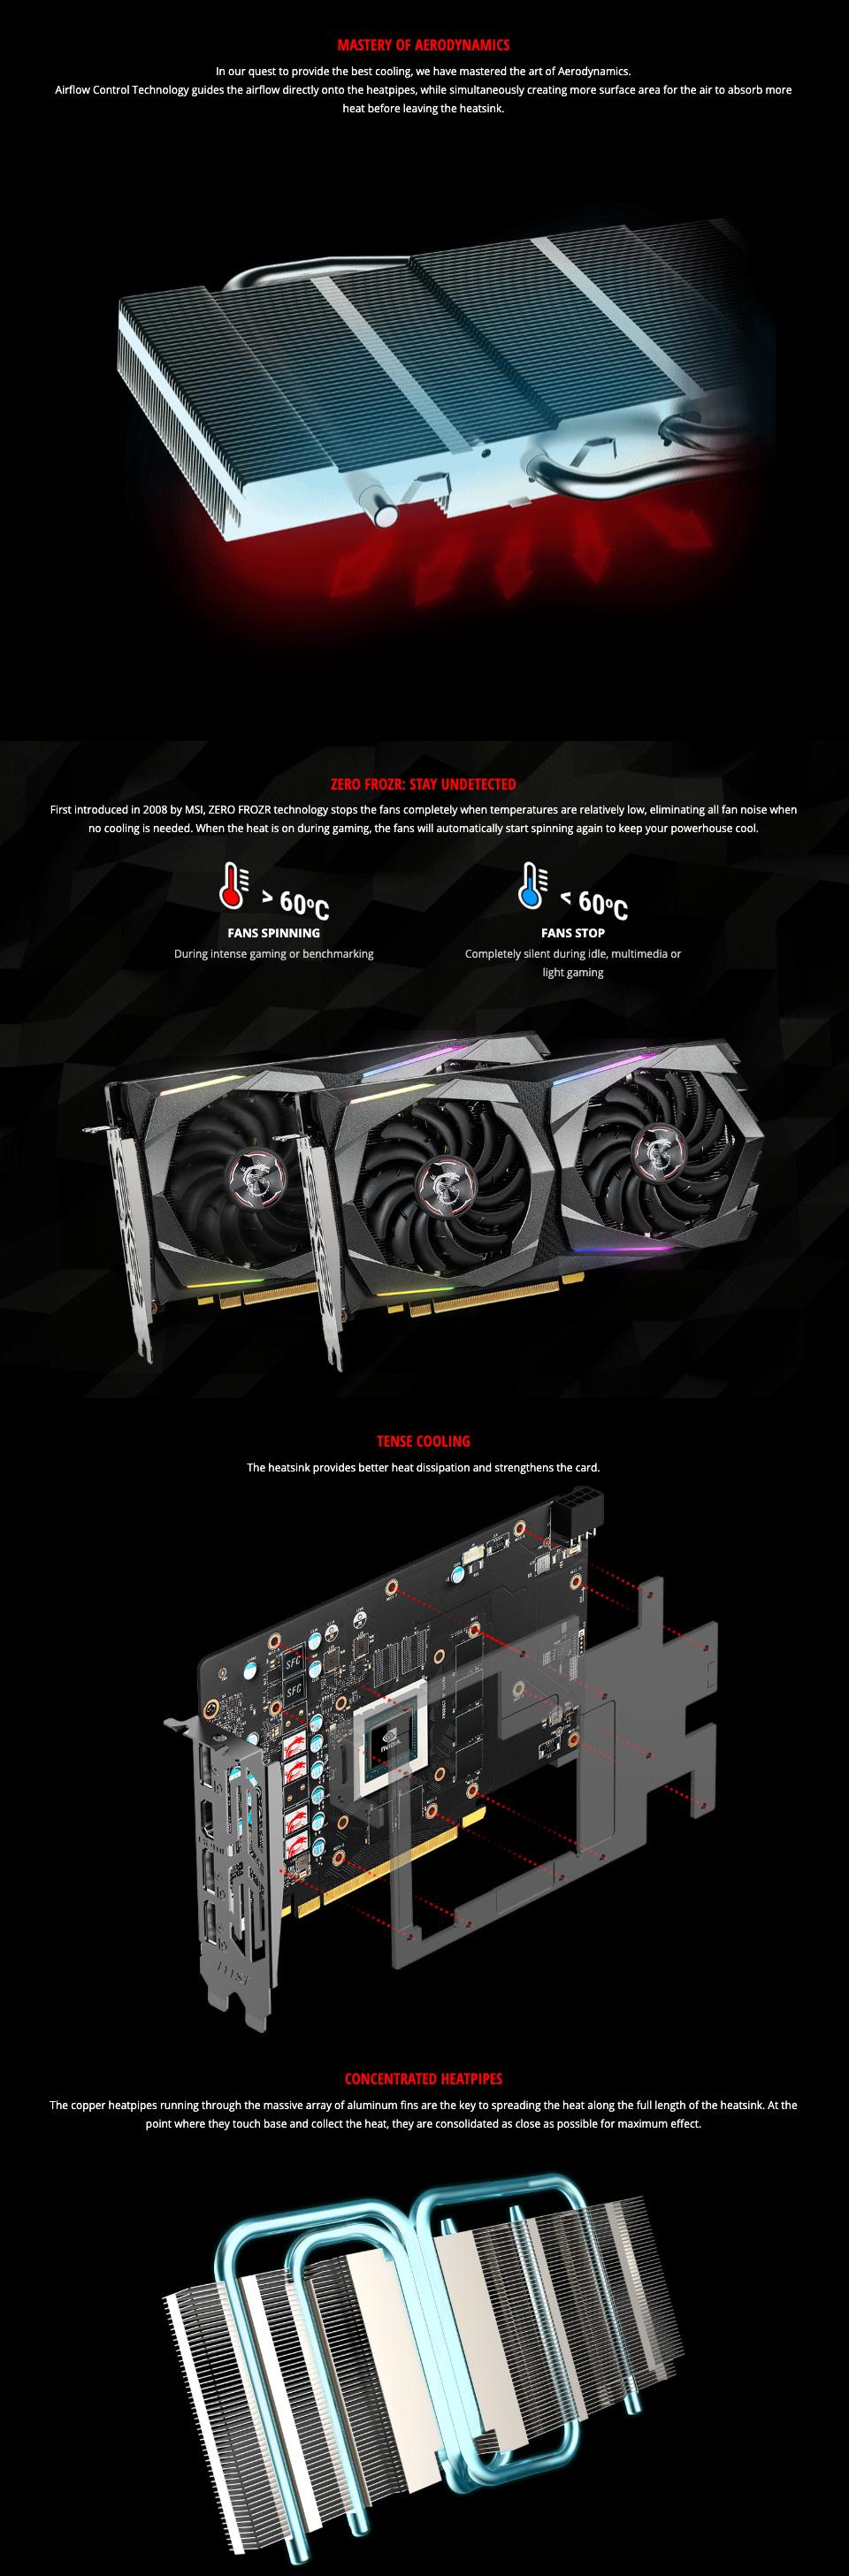 MSI GeForce GTX 1660 Super Gaming X 6GB features 3